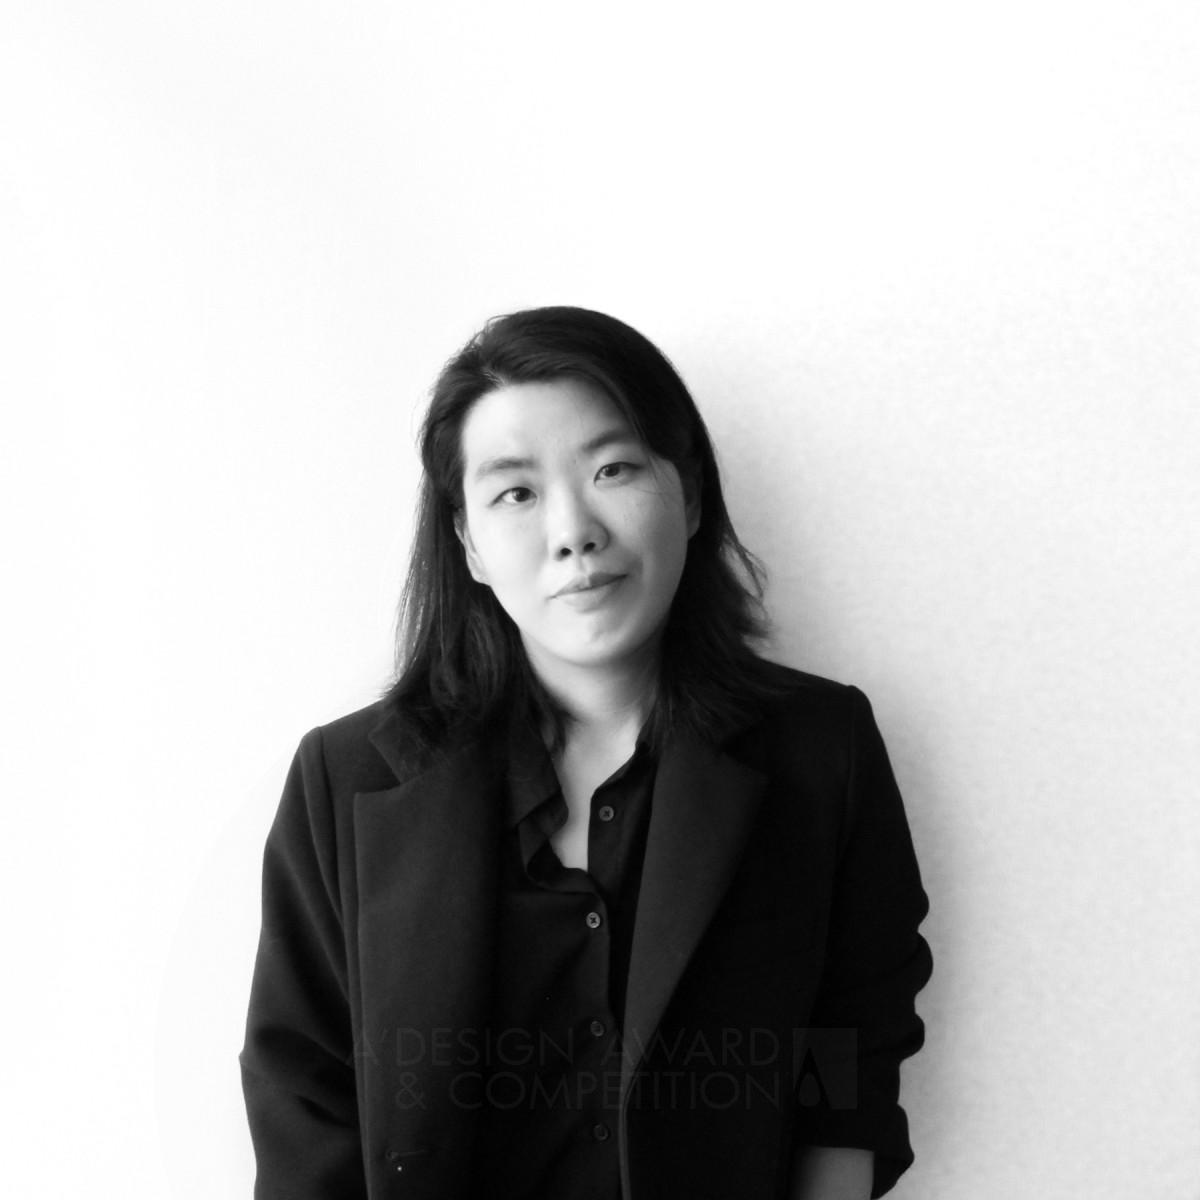 YuJin Jung